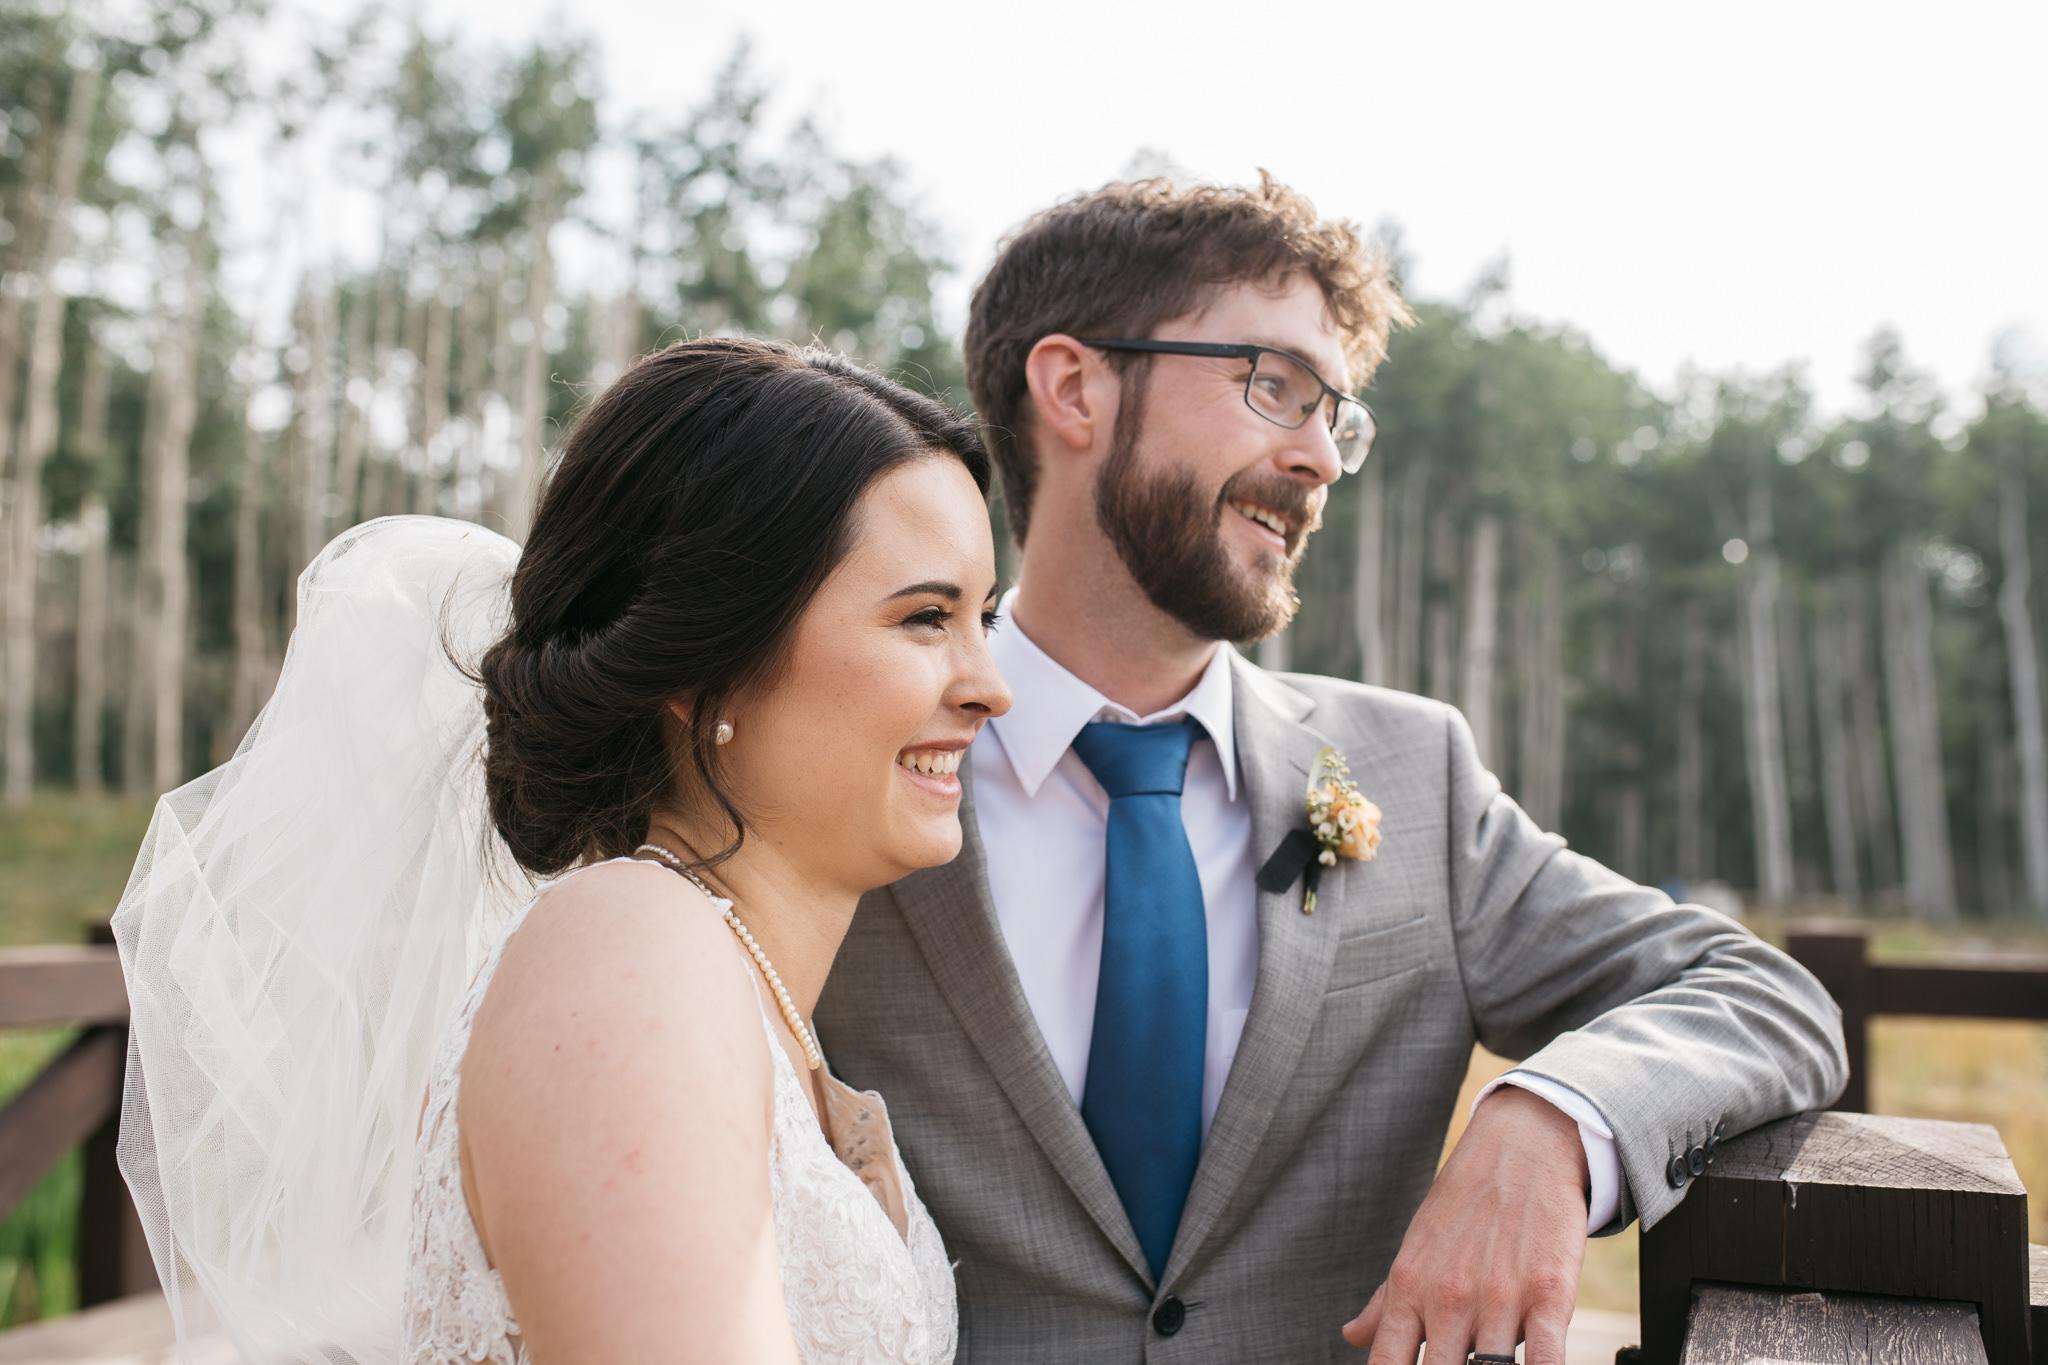 381_ONL_Kat_Nick_Wedding_Trevor_Hooper_Photo.jpg